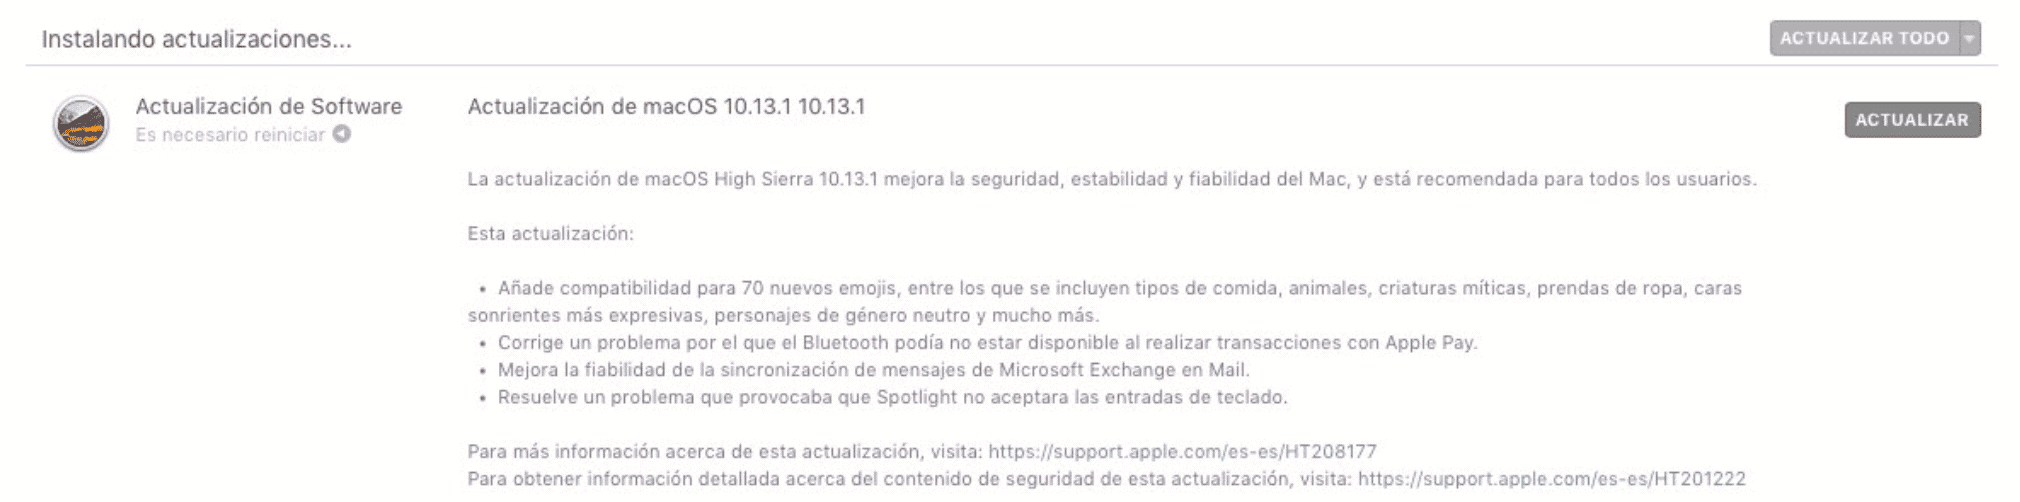 Apple publica macOS High Sierra 10.13.1